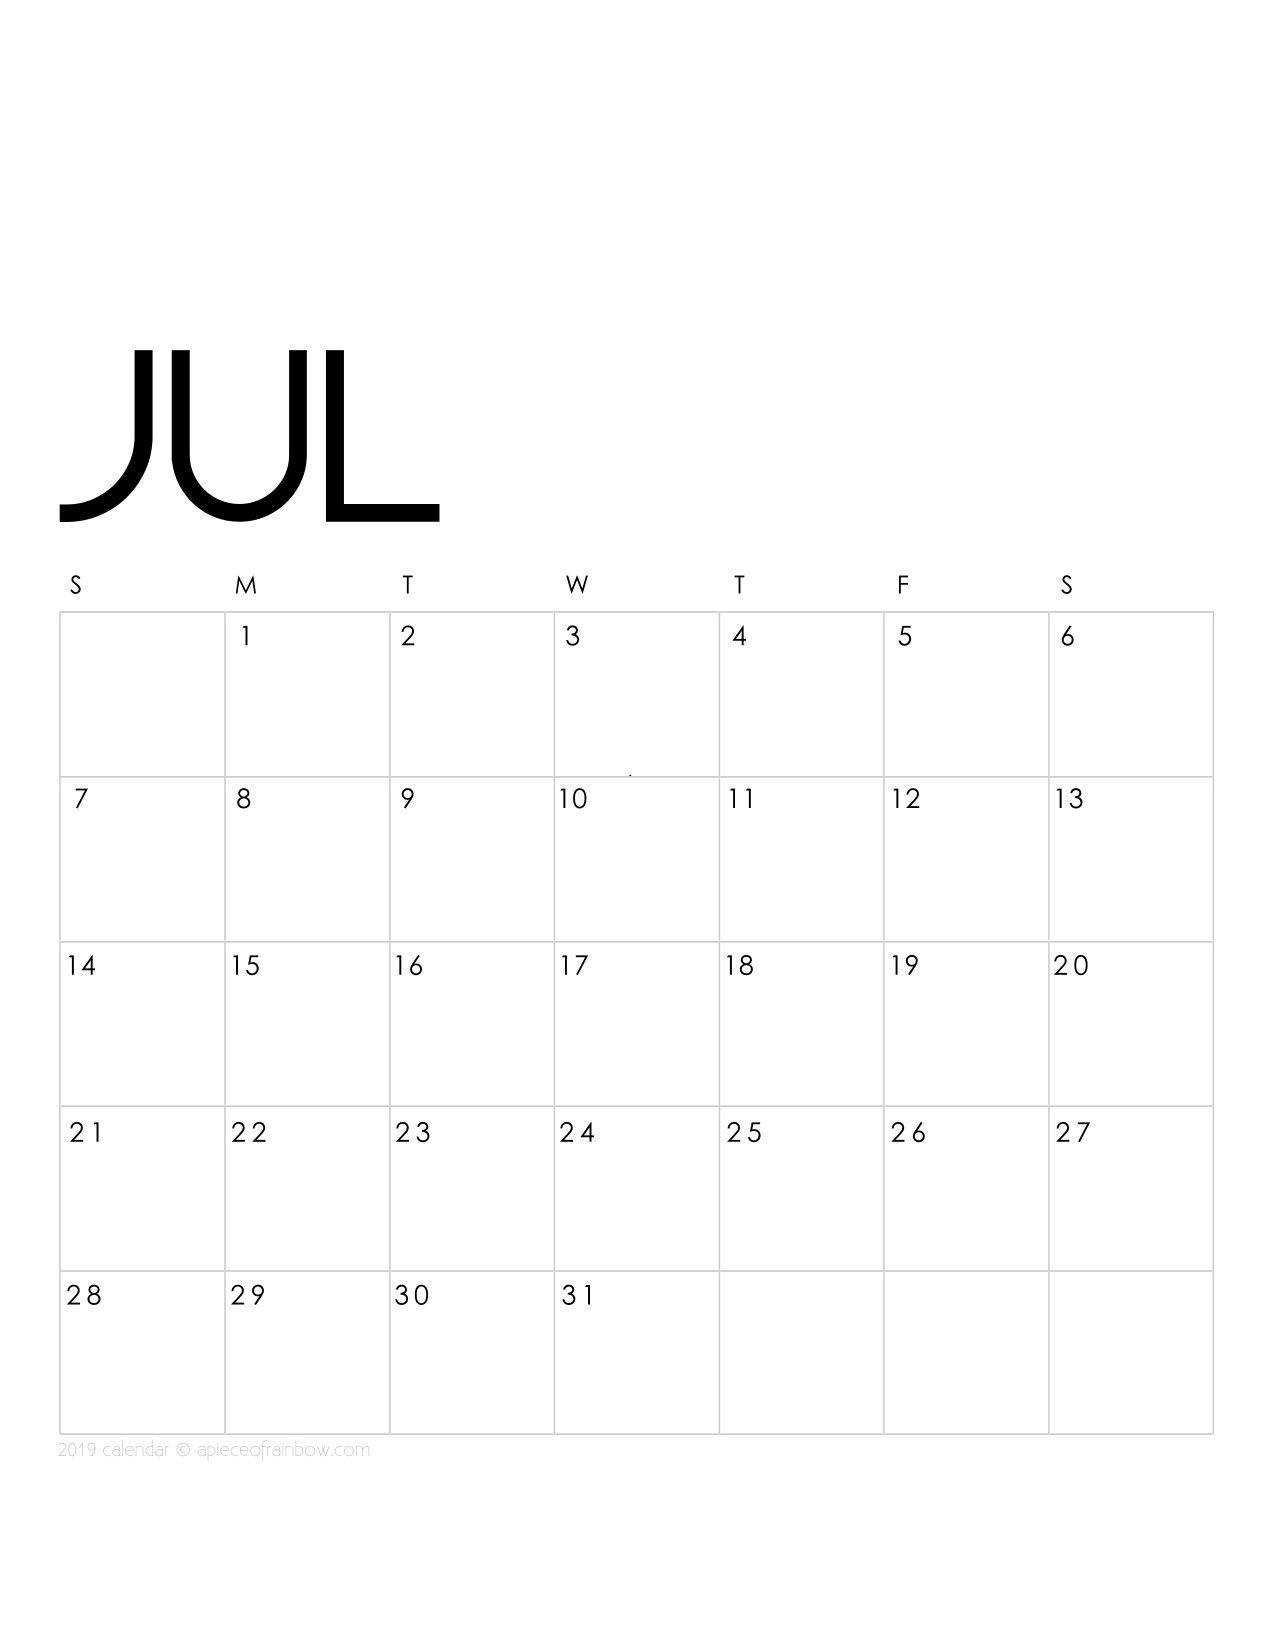 Calendar Monthly Planner Image By Michelle Slinger On Do